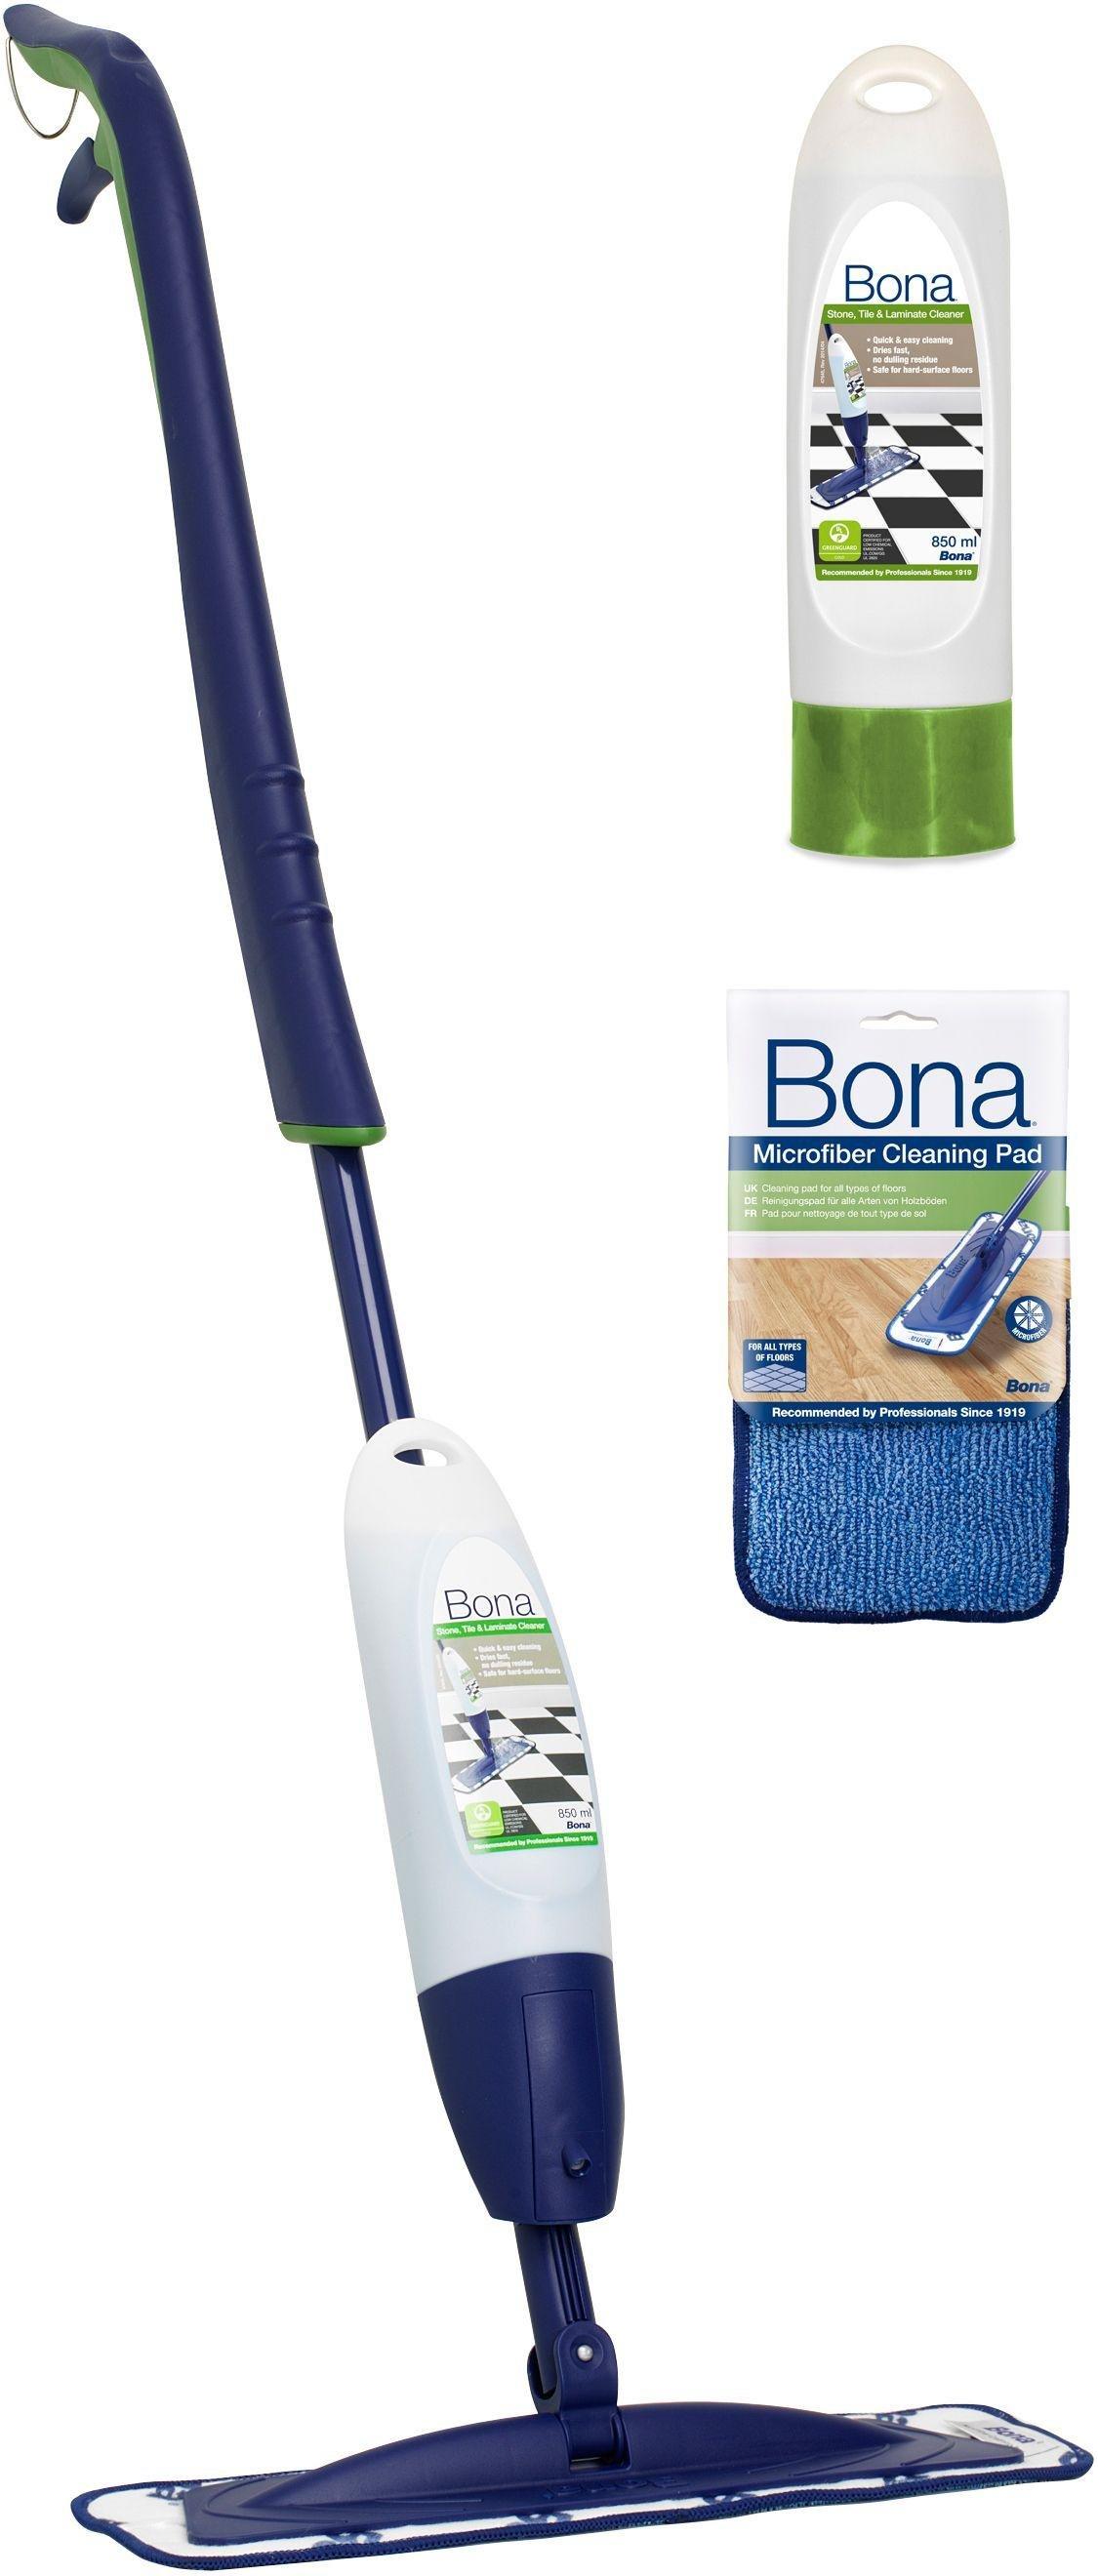 Bona Spray Mop Kit for Stone, Tile and Laminate Floors.